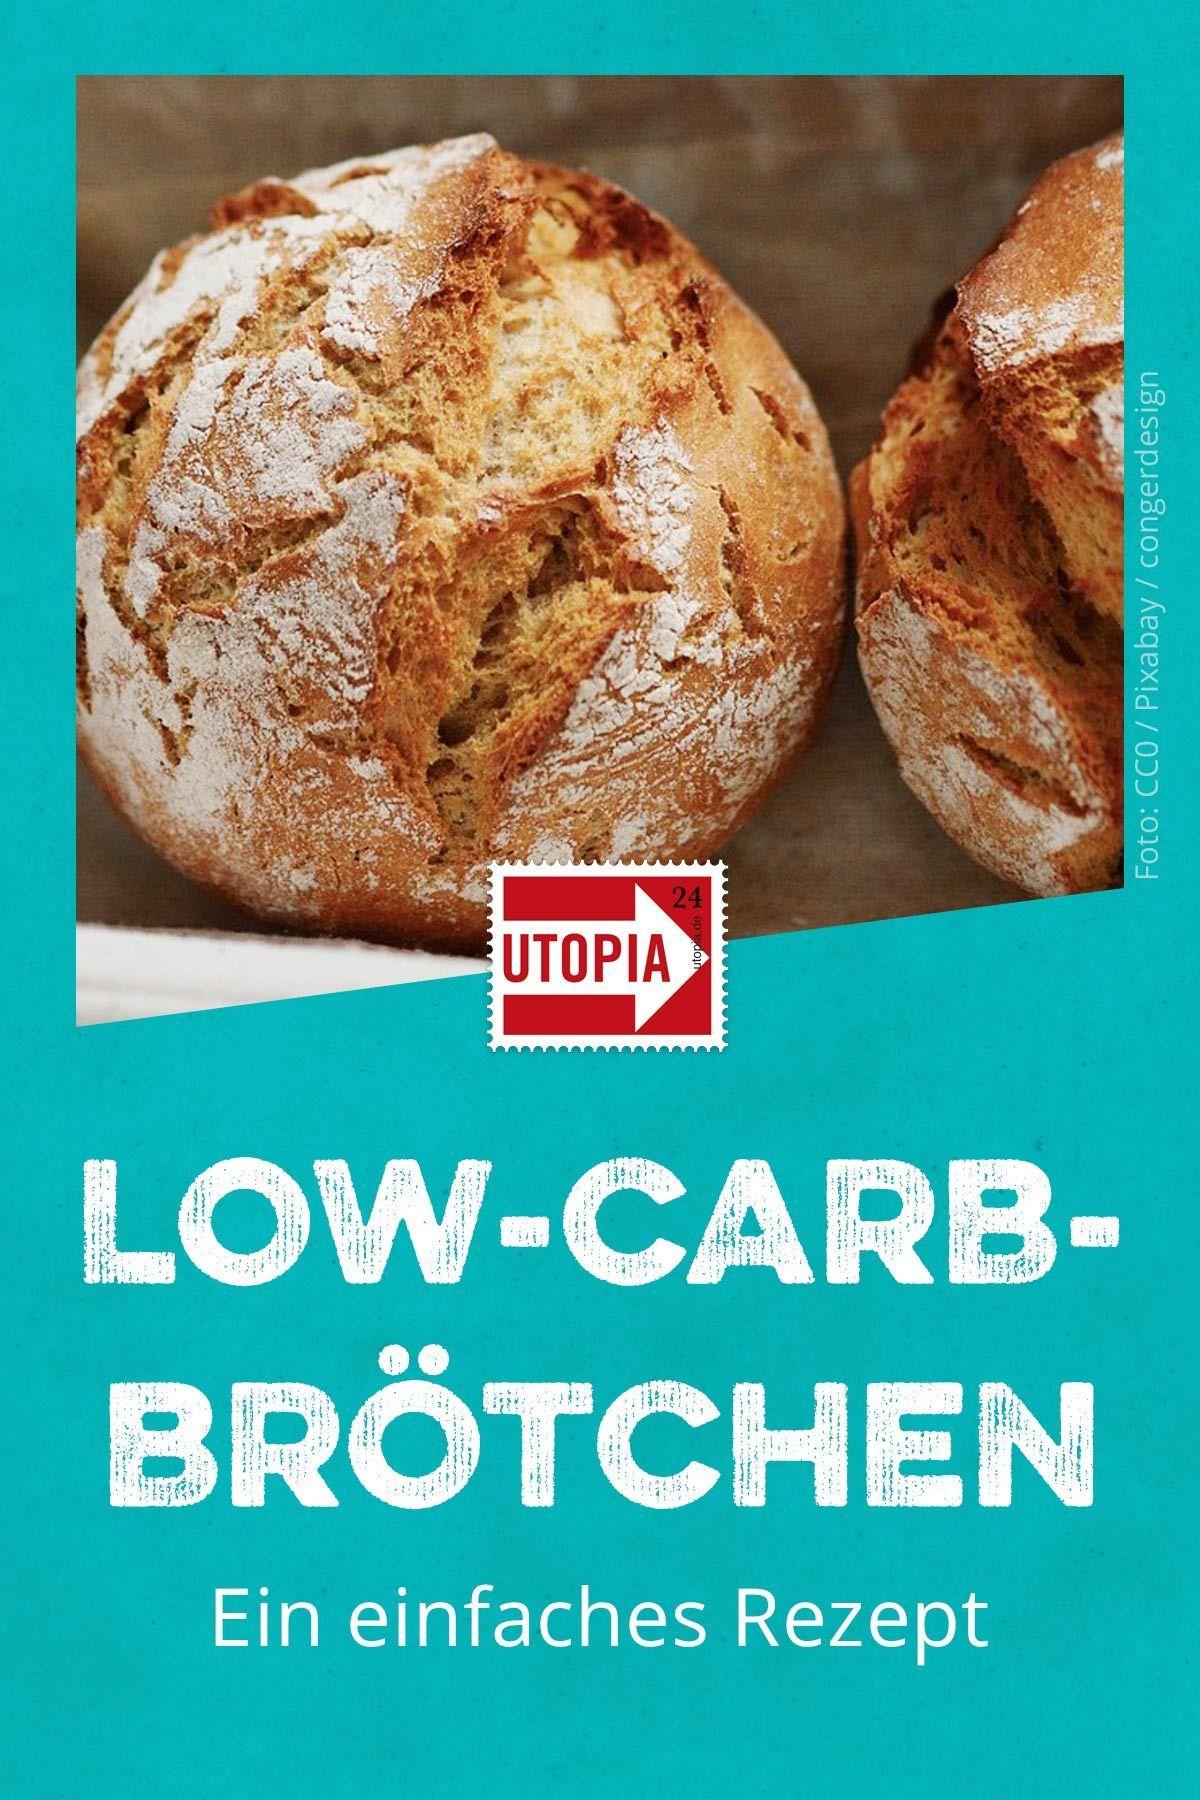 Low-Carb-Brötchen: Ein einfaches Rezept - Utopia.de